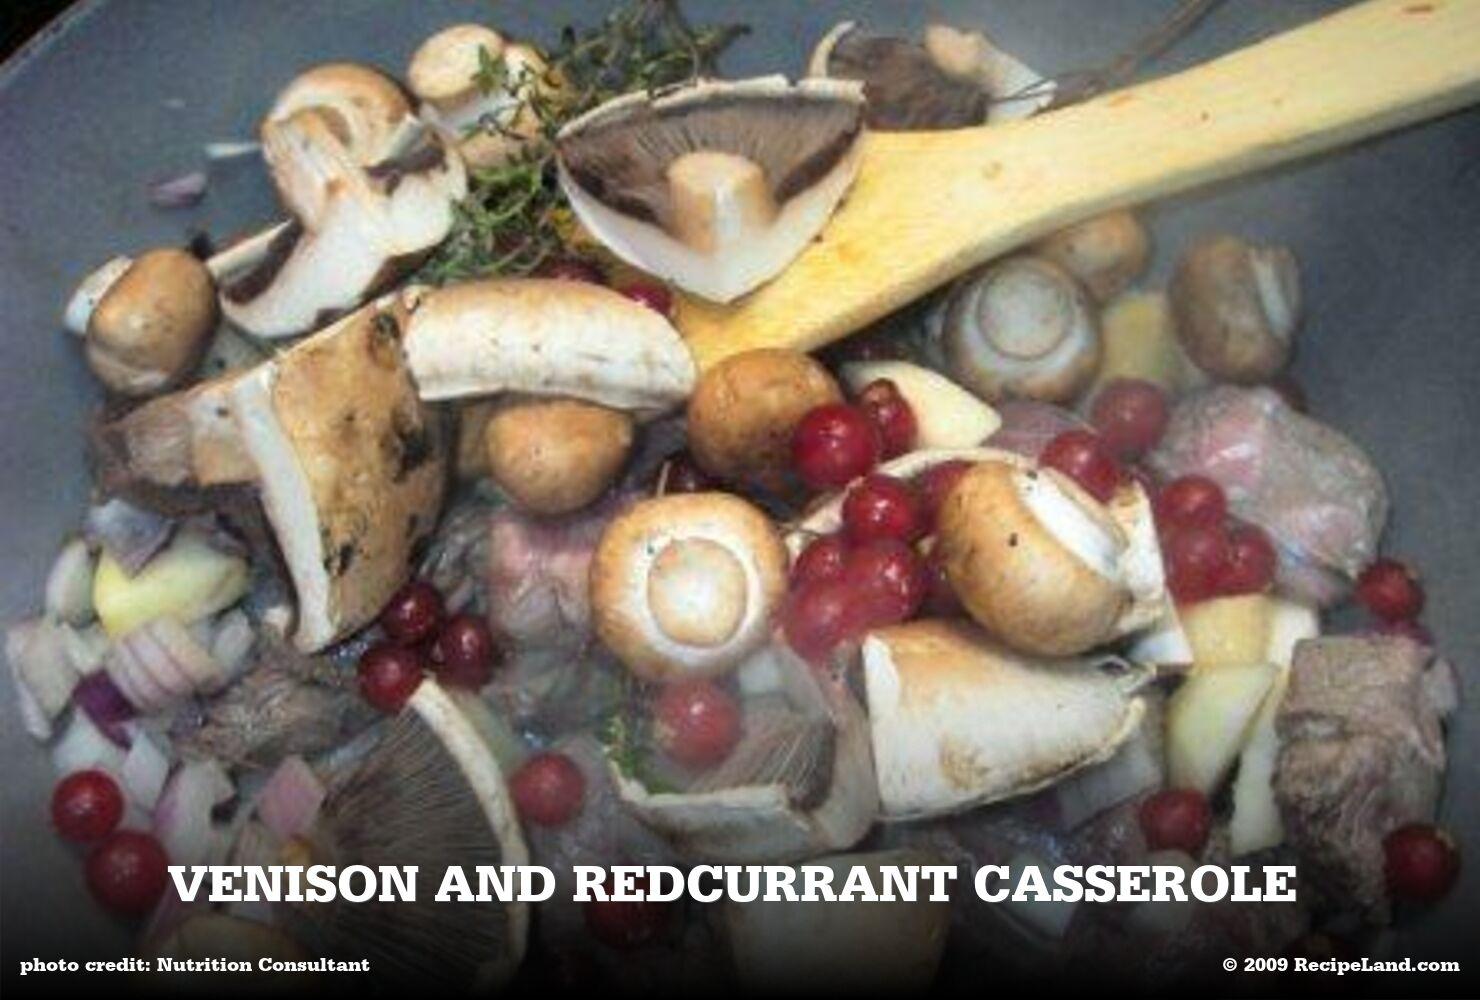 Venison and Redcurrant Casserole